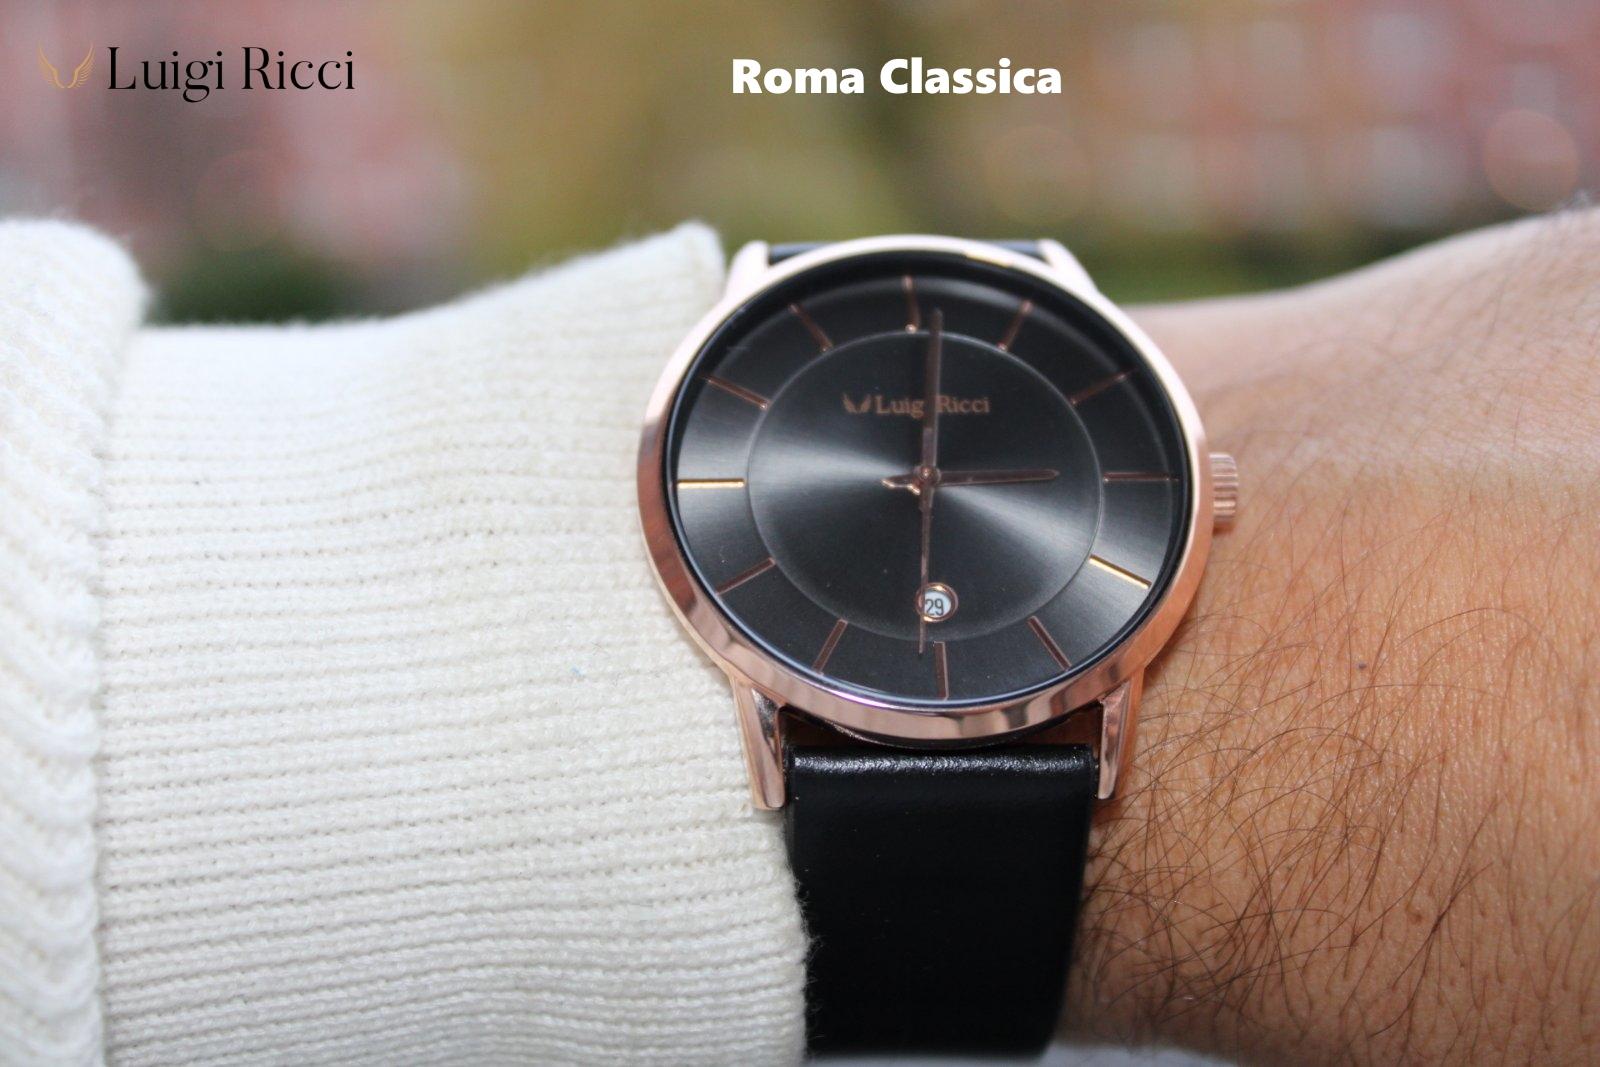 Luigi Ricci Roma Classica Italian quality unisex wrist watch Black with leather